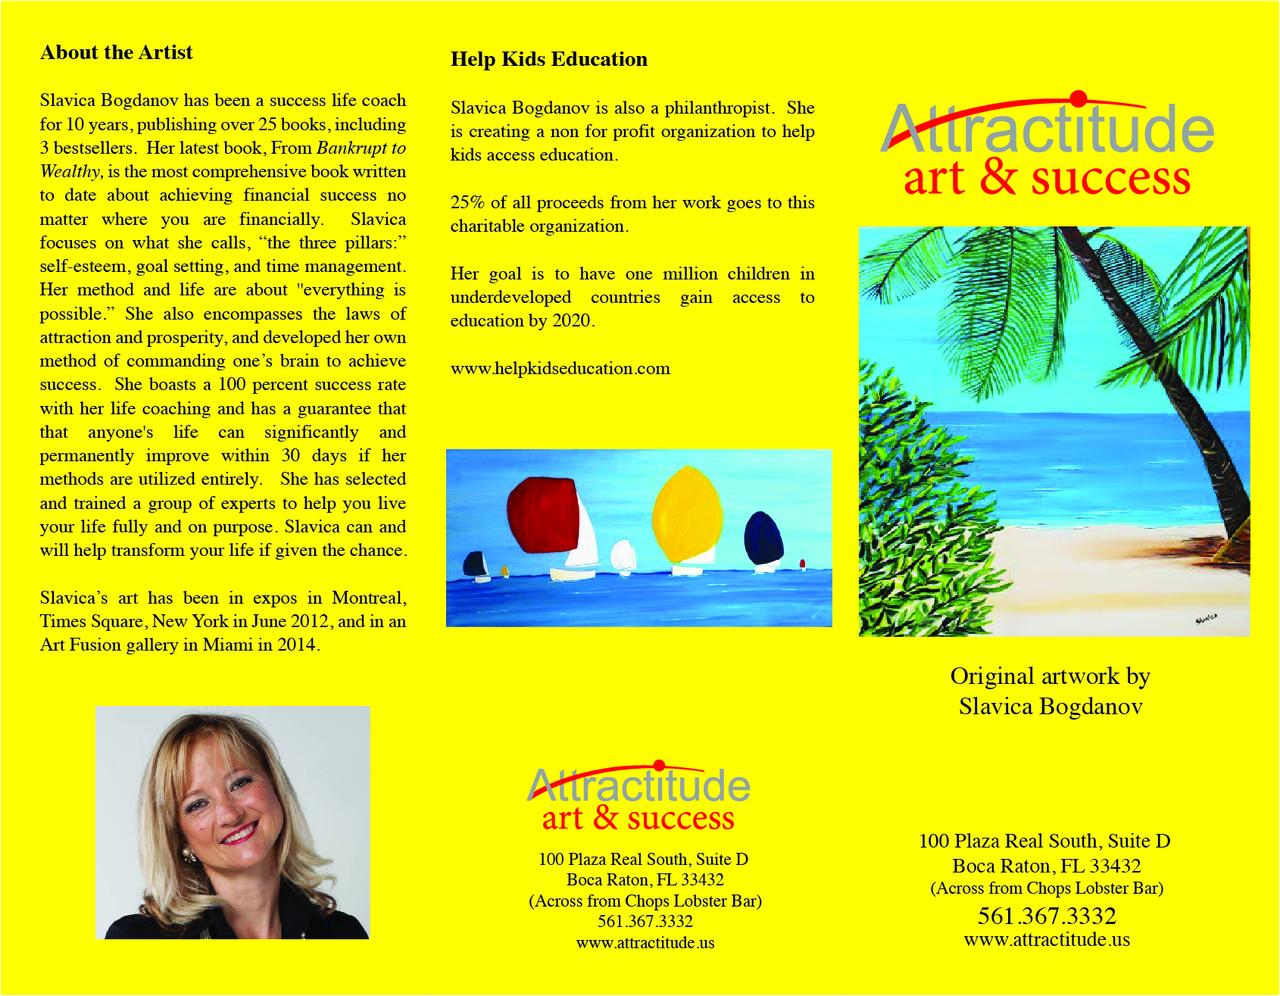 galerie de Slavica Bogdanov à Boca Raton FLORIDE